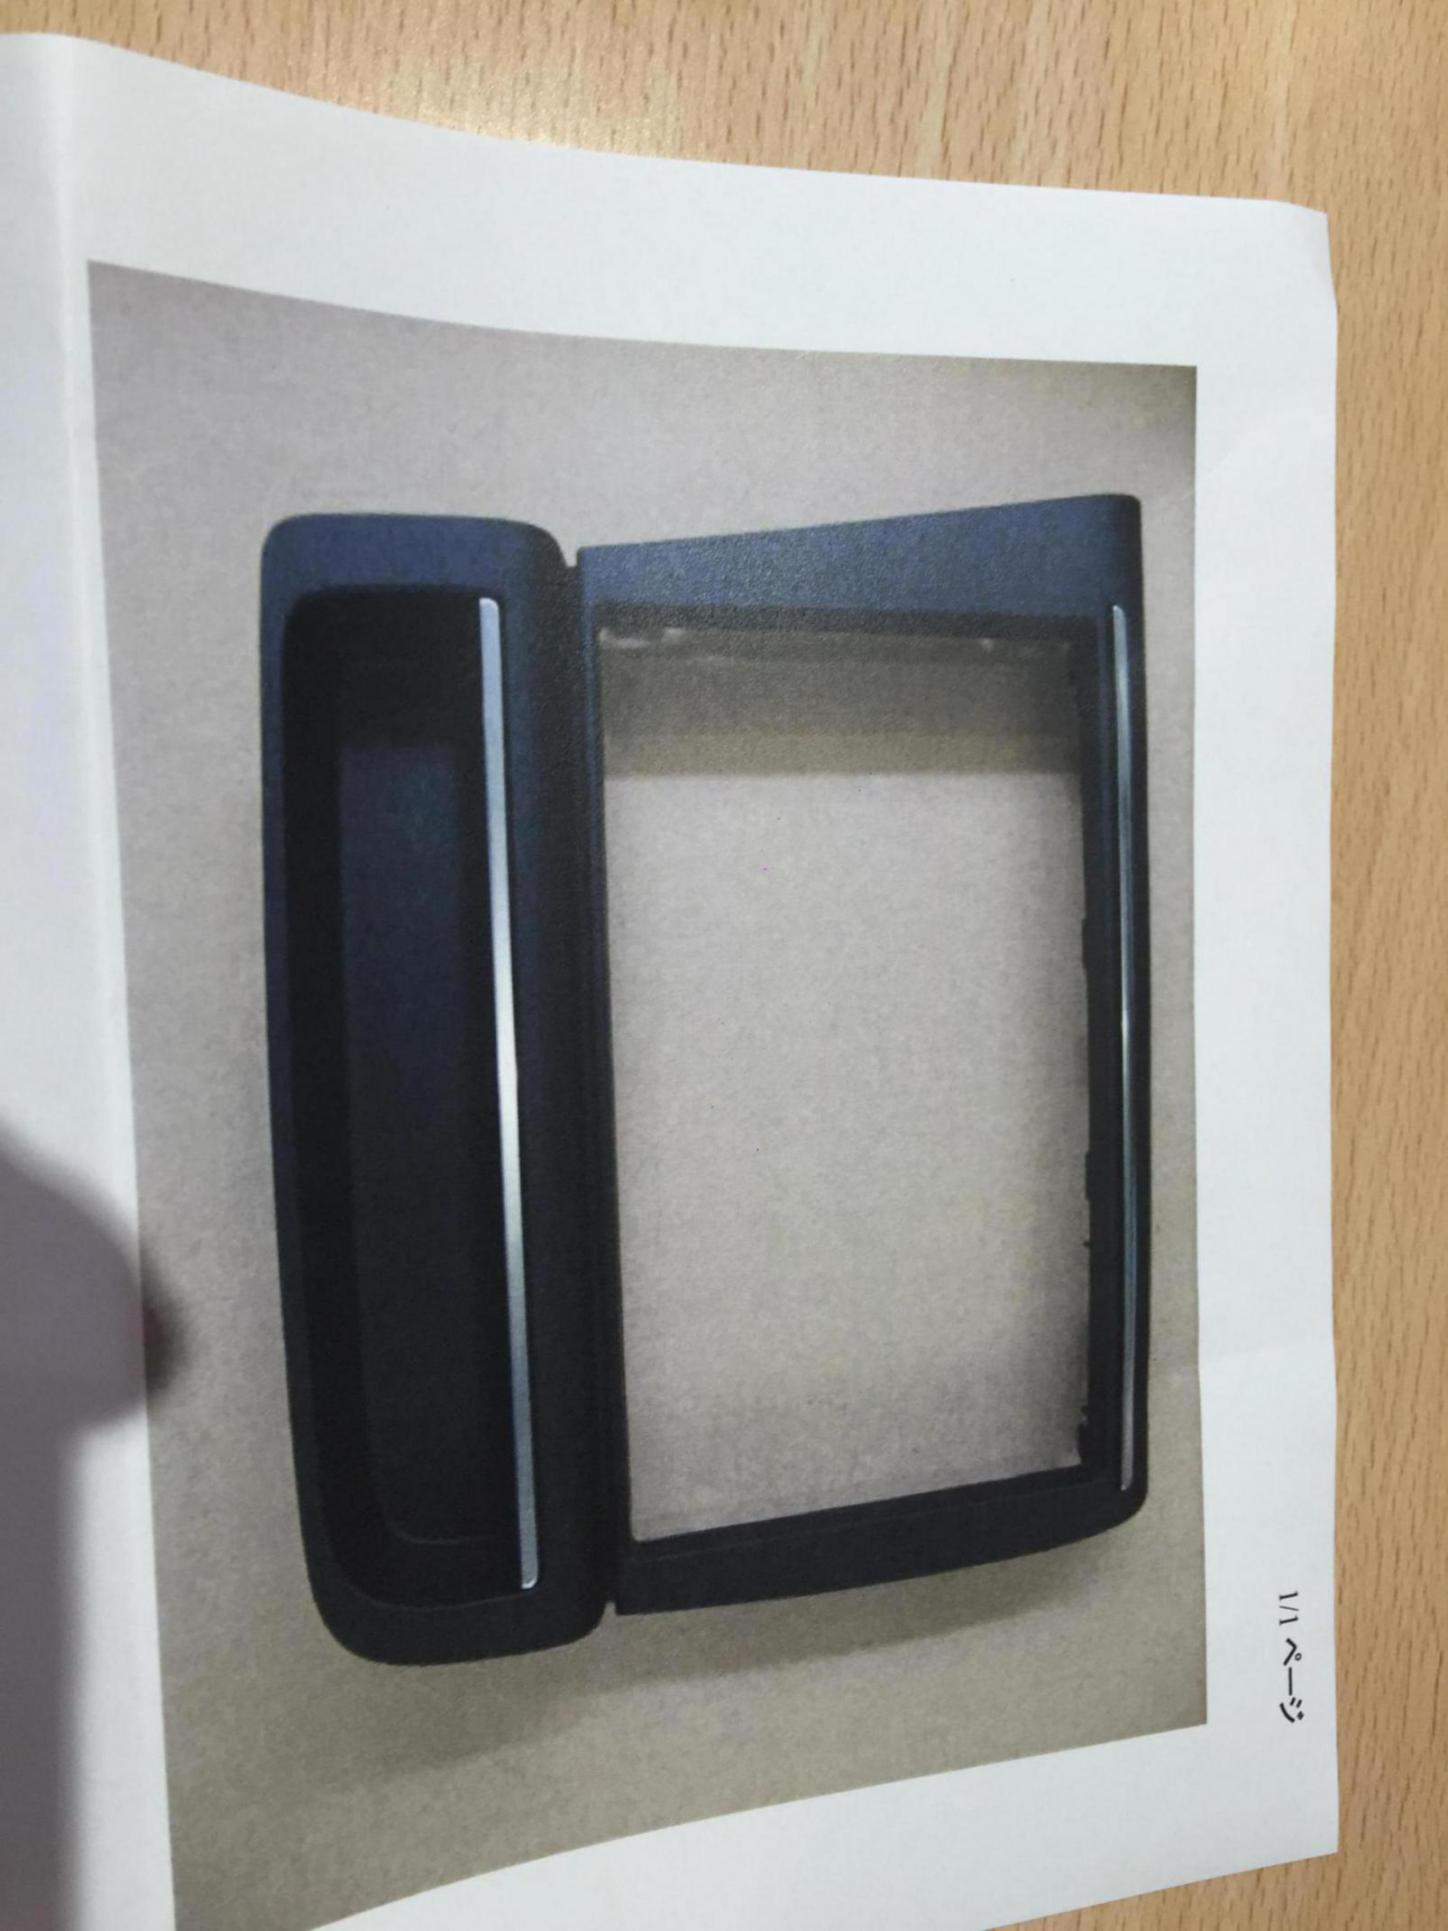 Radio trim for aftermarket install-image_1473666120713.jpg